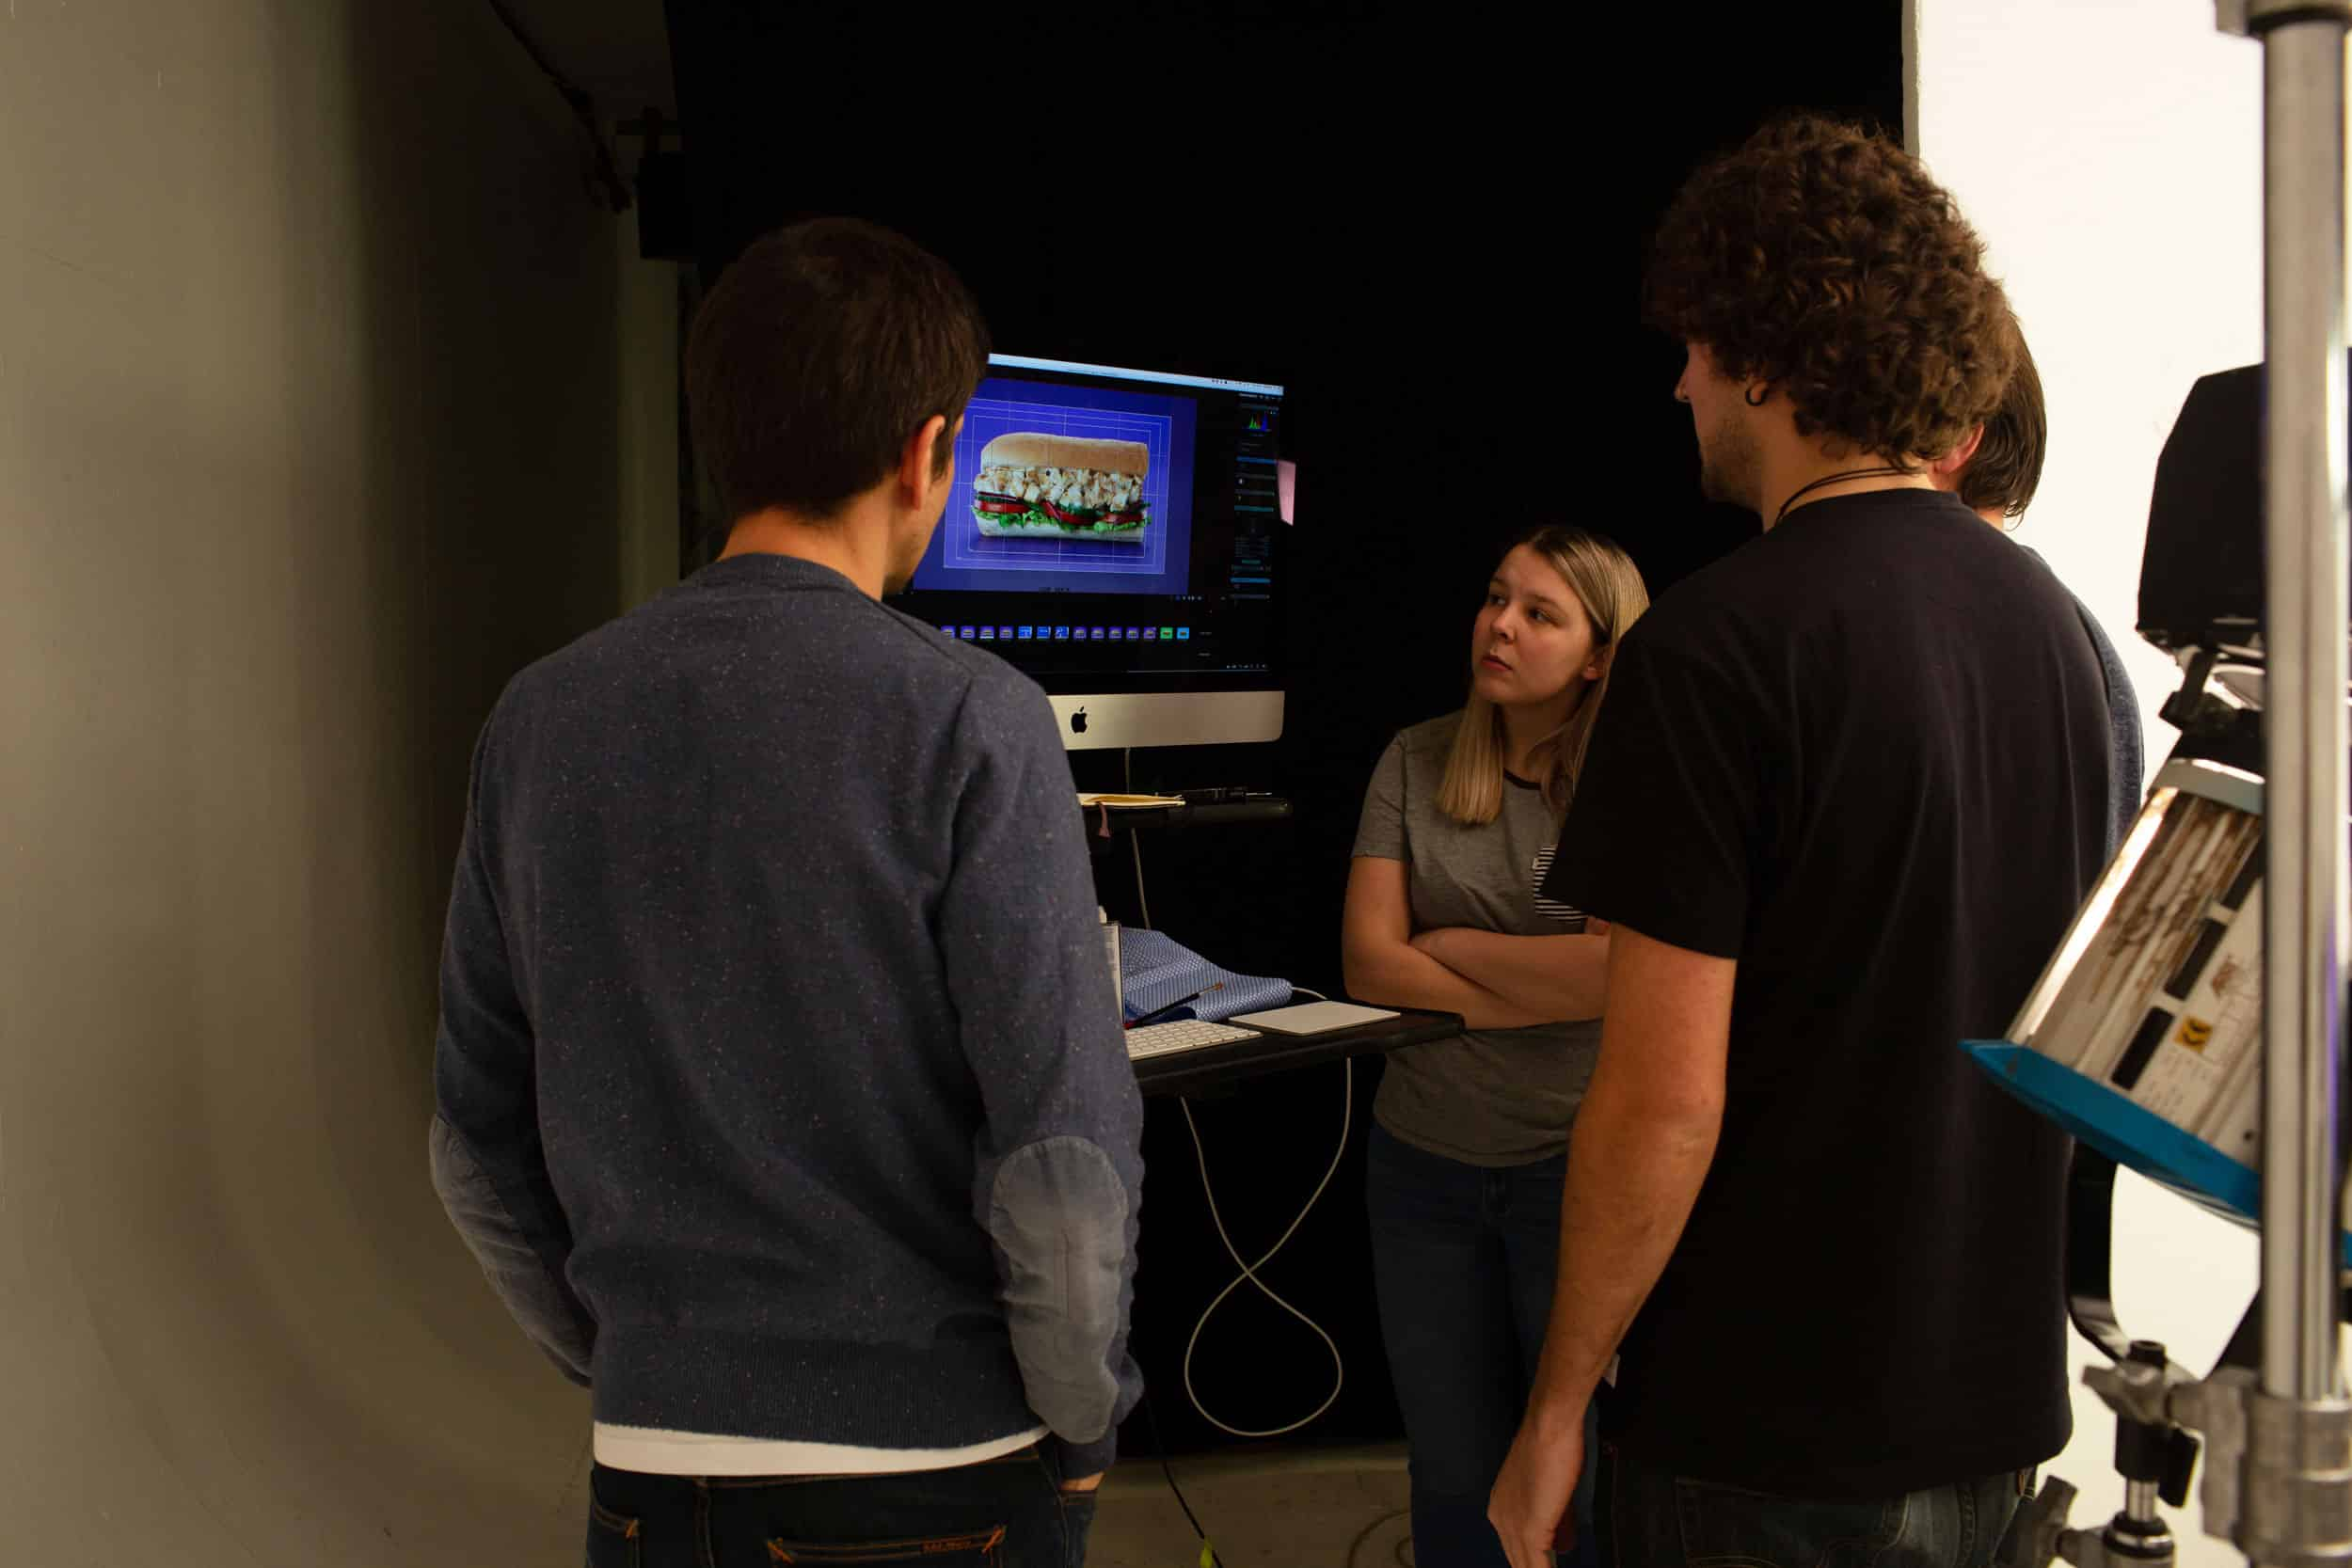 Examining a Subway on the monitor